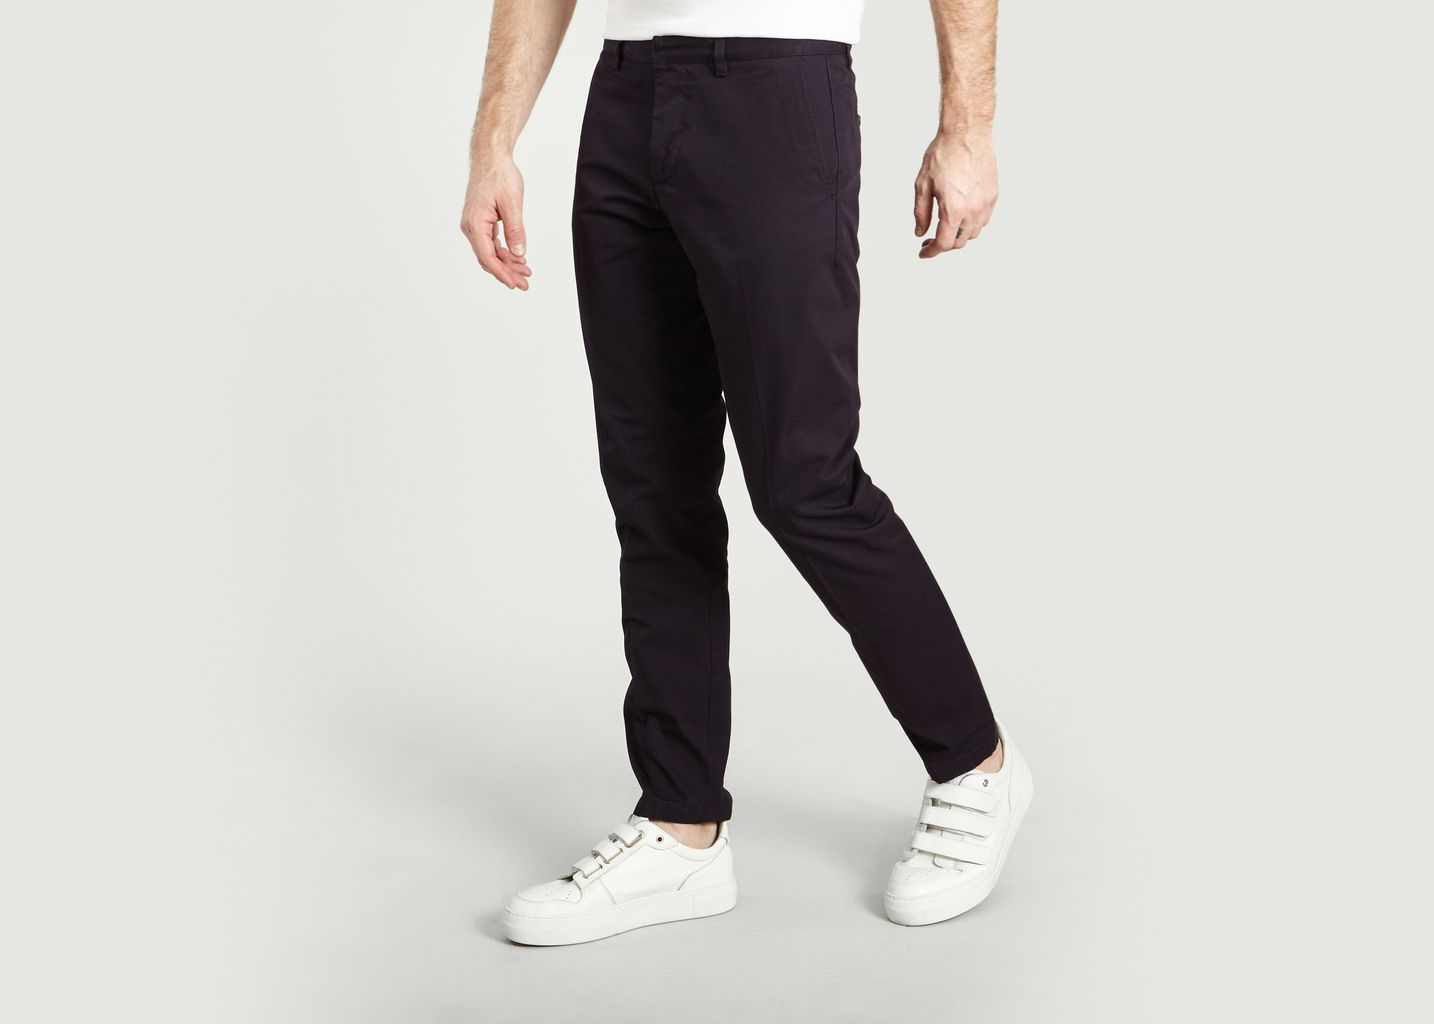 Pantalon Chino - AMI Alexandre Mattiussi